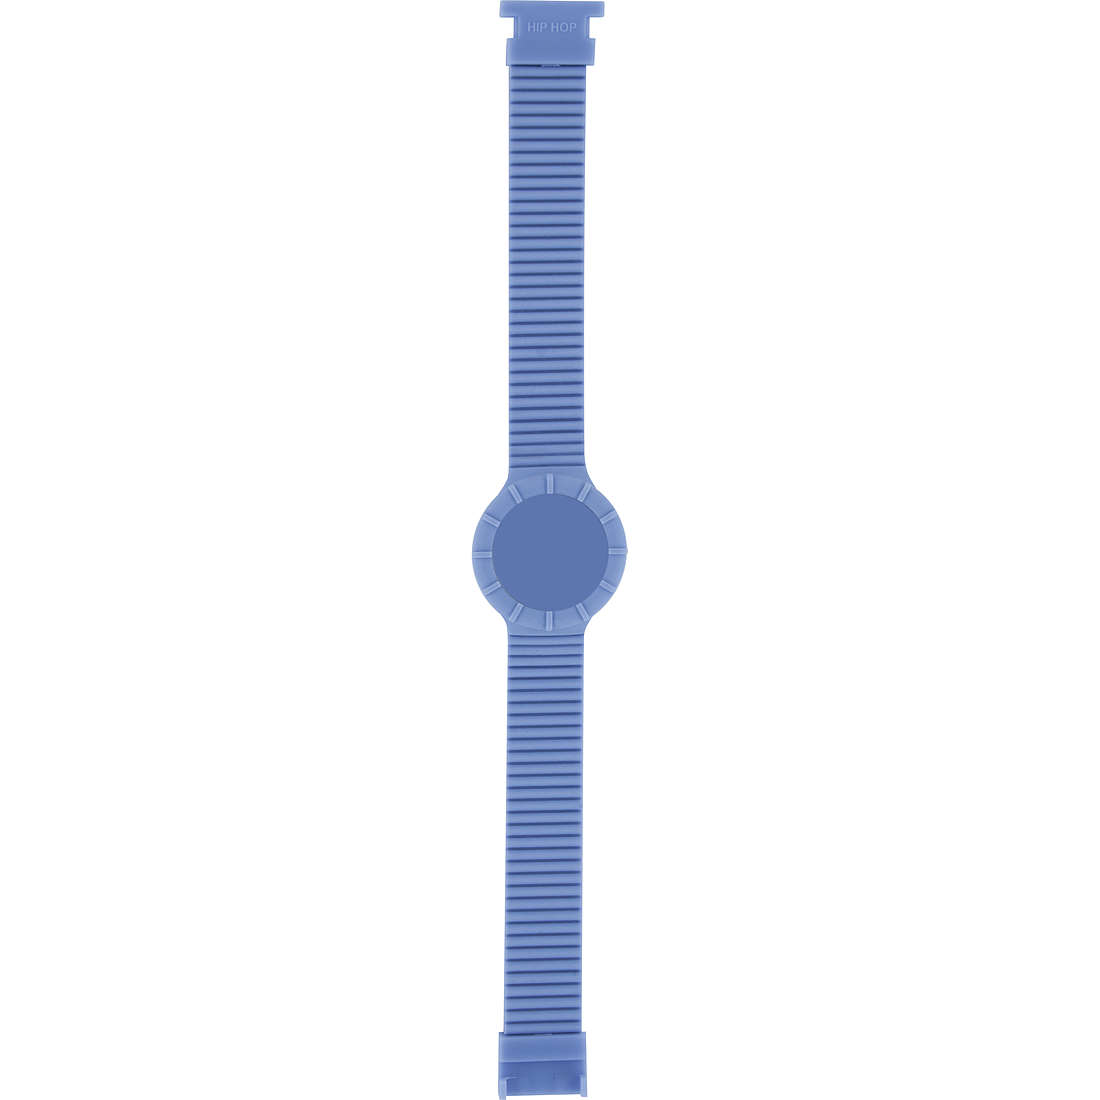 orologio accessorio unisex Hip Hop Hero HBU0256